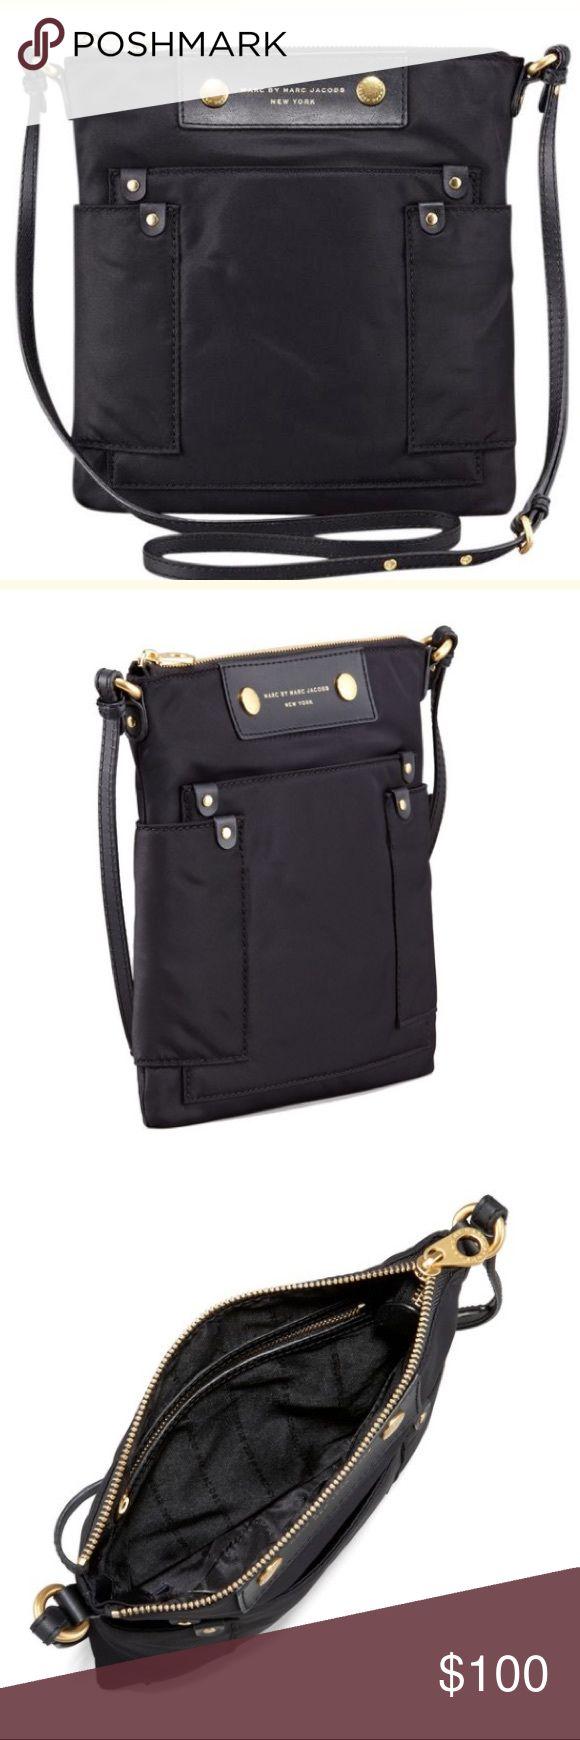 Marc Jacobs preppy nylon sia crossbody bag See pic for description Marc Jacobs Bags Crossbody Bags